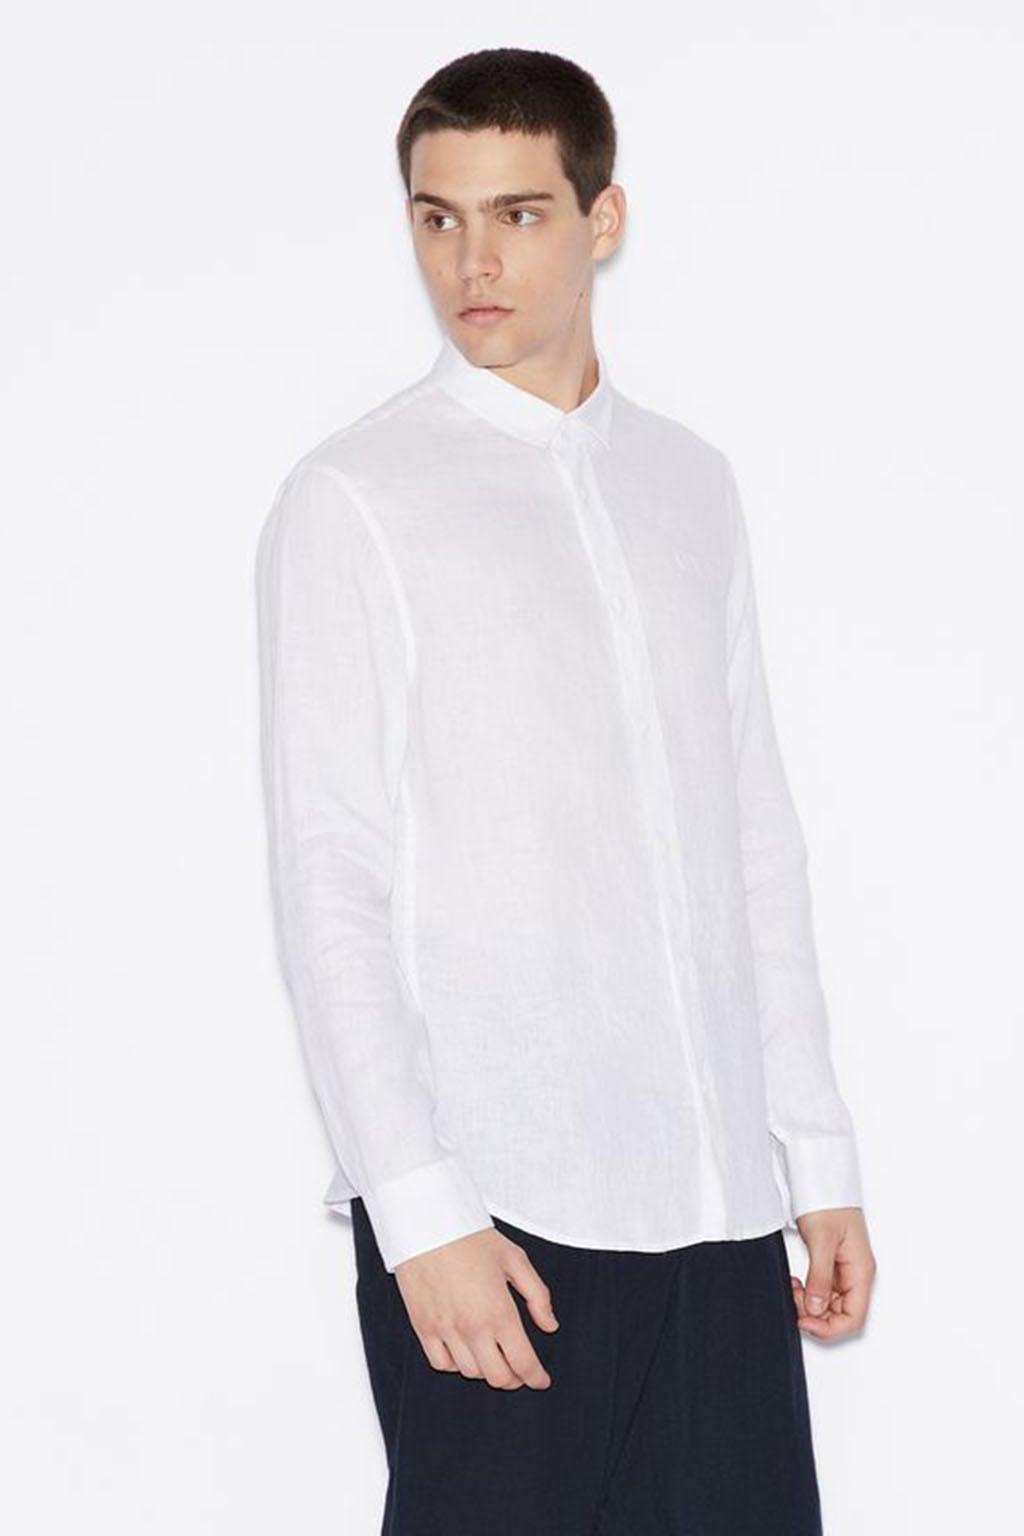 Linnen Overhemd Wit.Armani Exchange Linnen Overhemd Blauw Koop Je Online Kellyjeans Nl